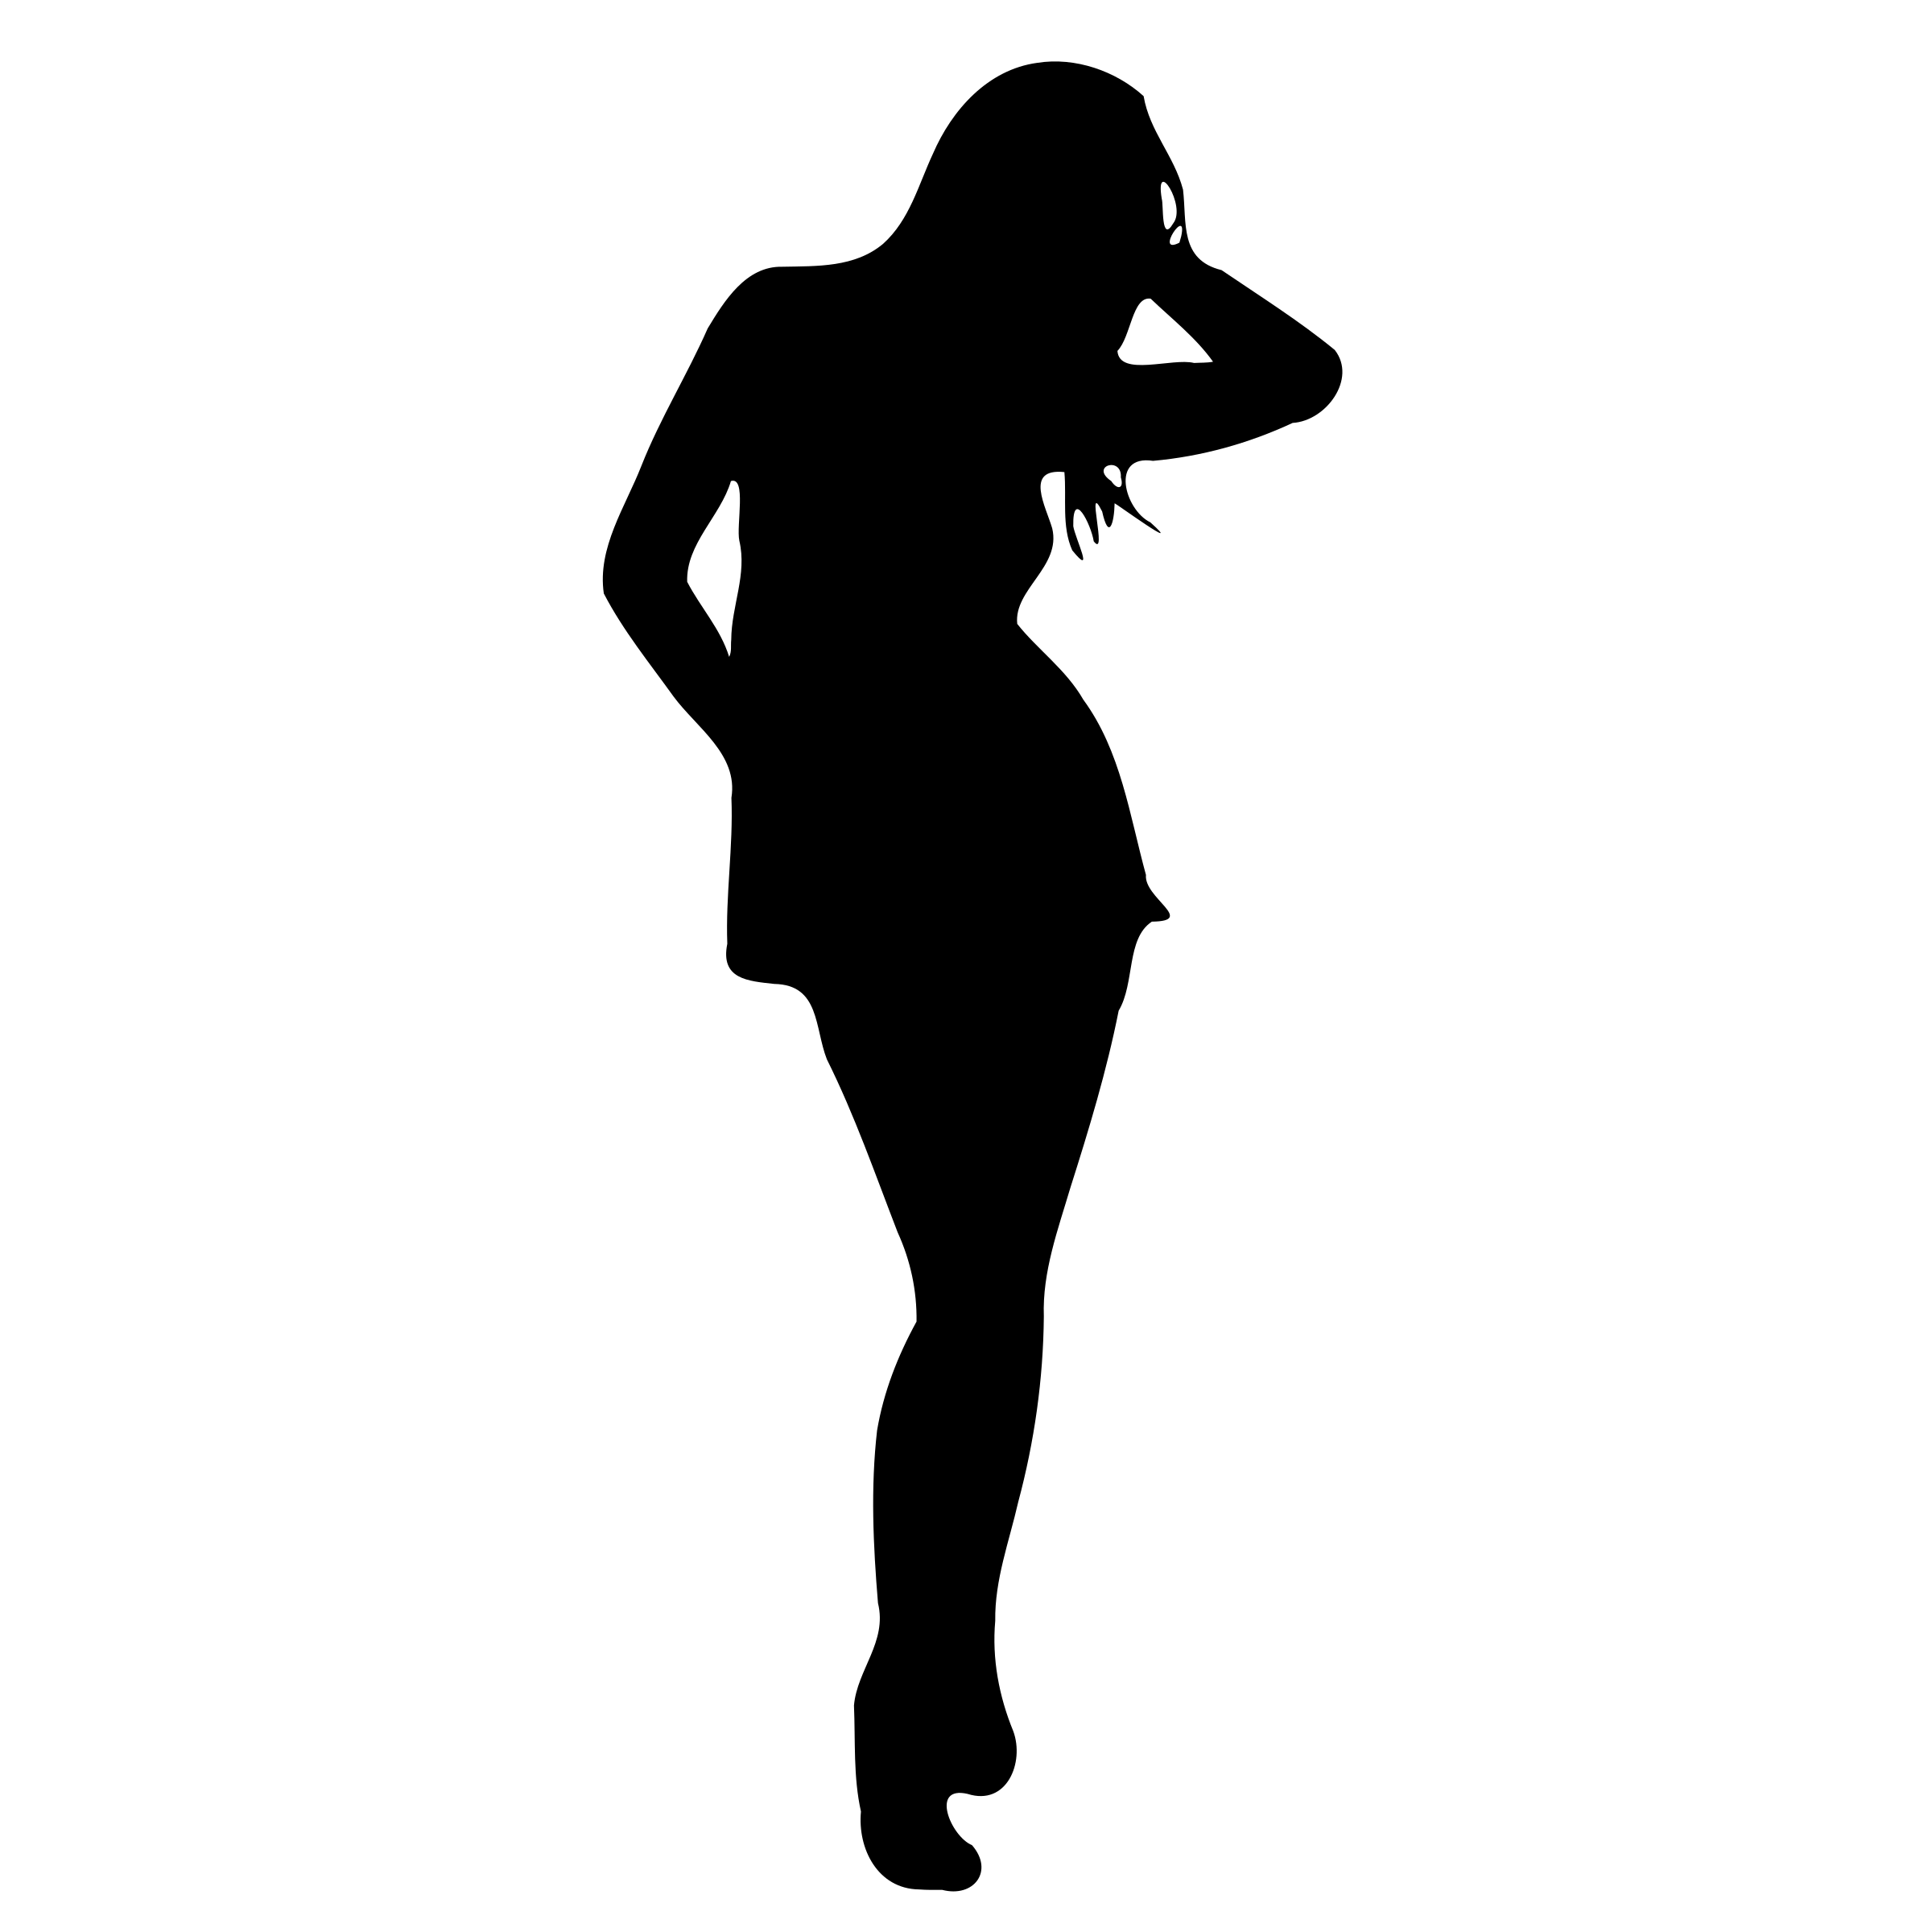 Female clipart female human. Woman silhouette big image